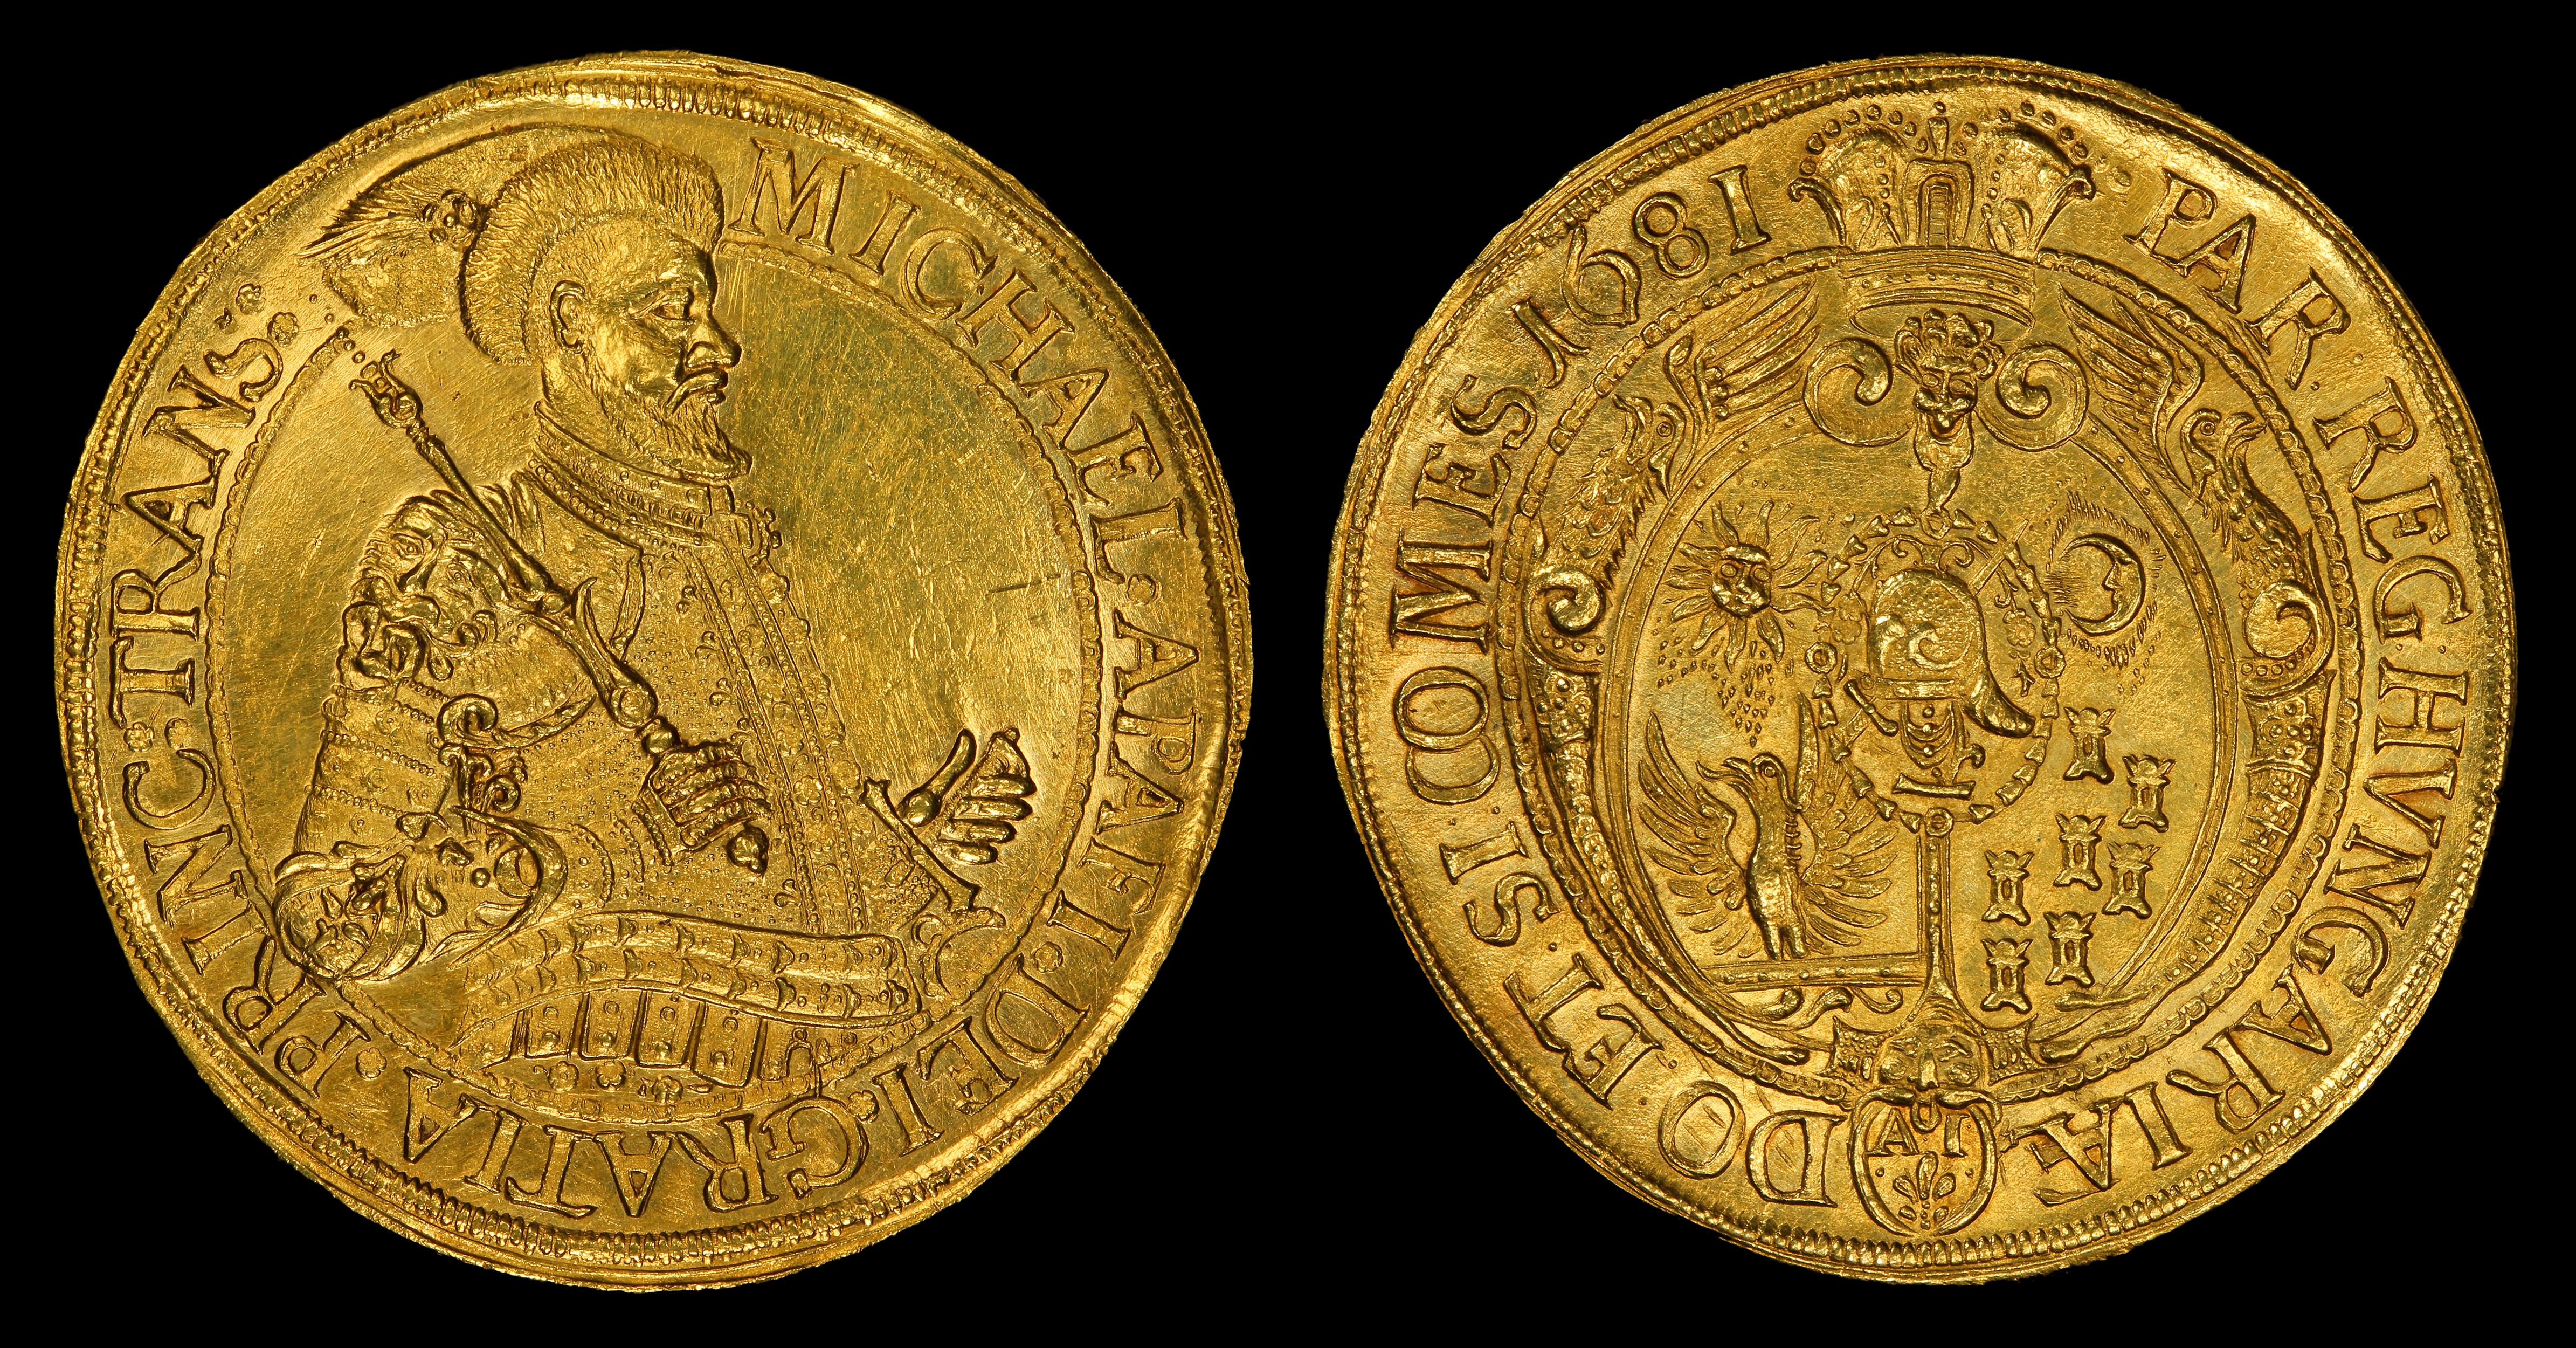 File:Transylvania 1681 25 Ducat gold coin.jpg